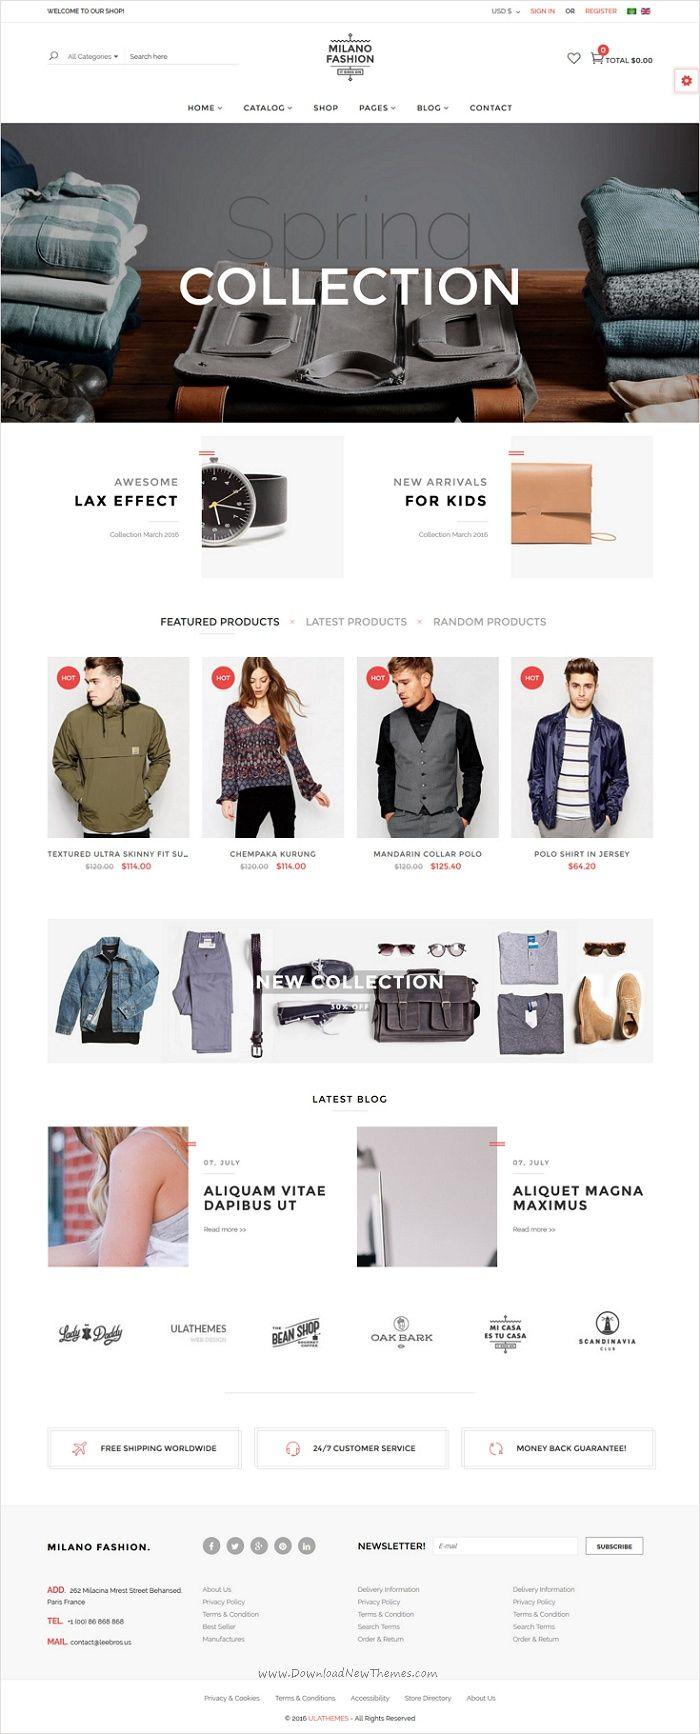 Joomla tshirt design - Milano Is Perfectly Design Responsive Virtuemart Joomla Template For Amazing Clothes Store Ecommerce